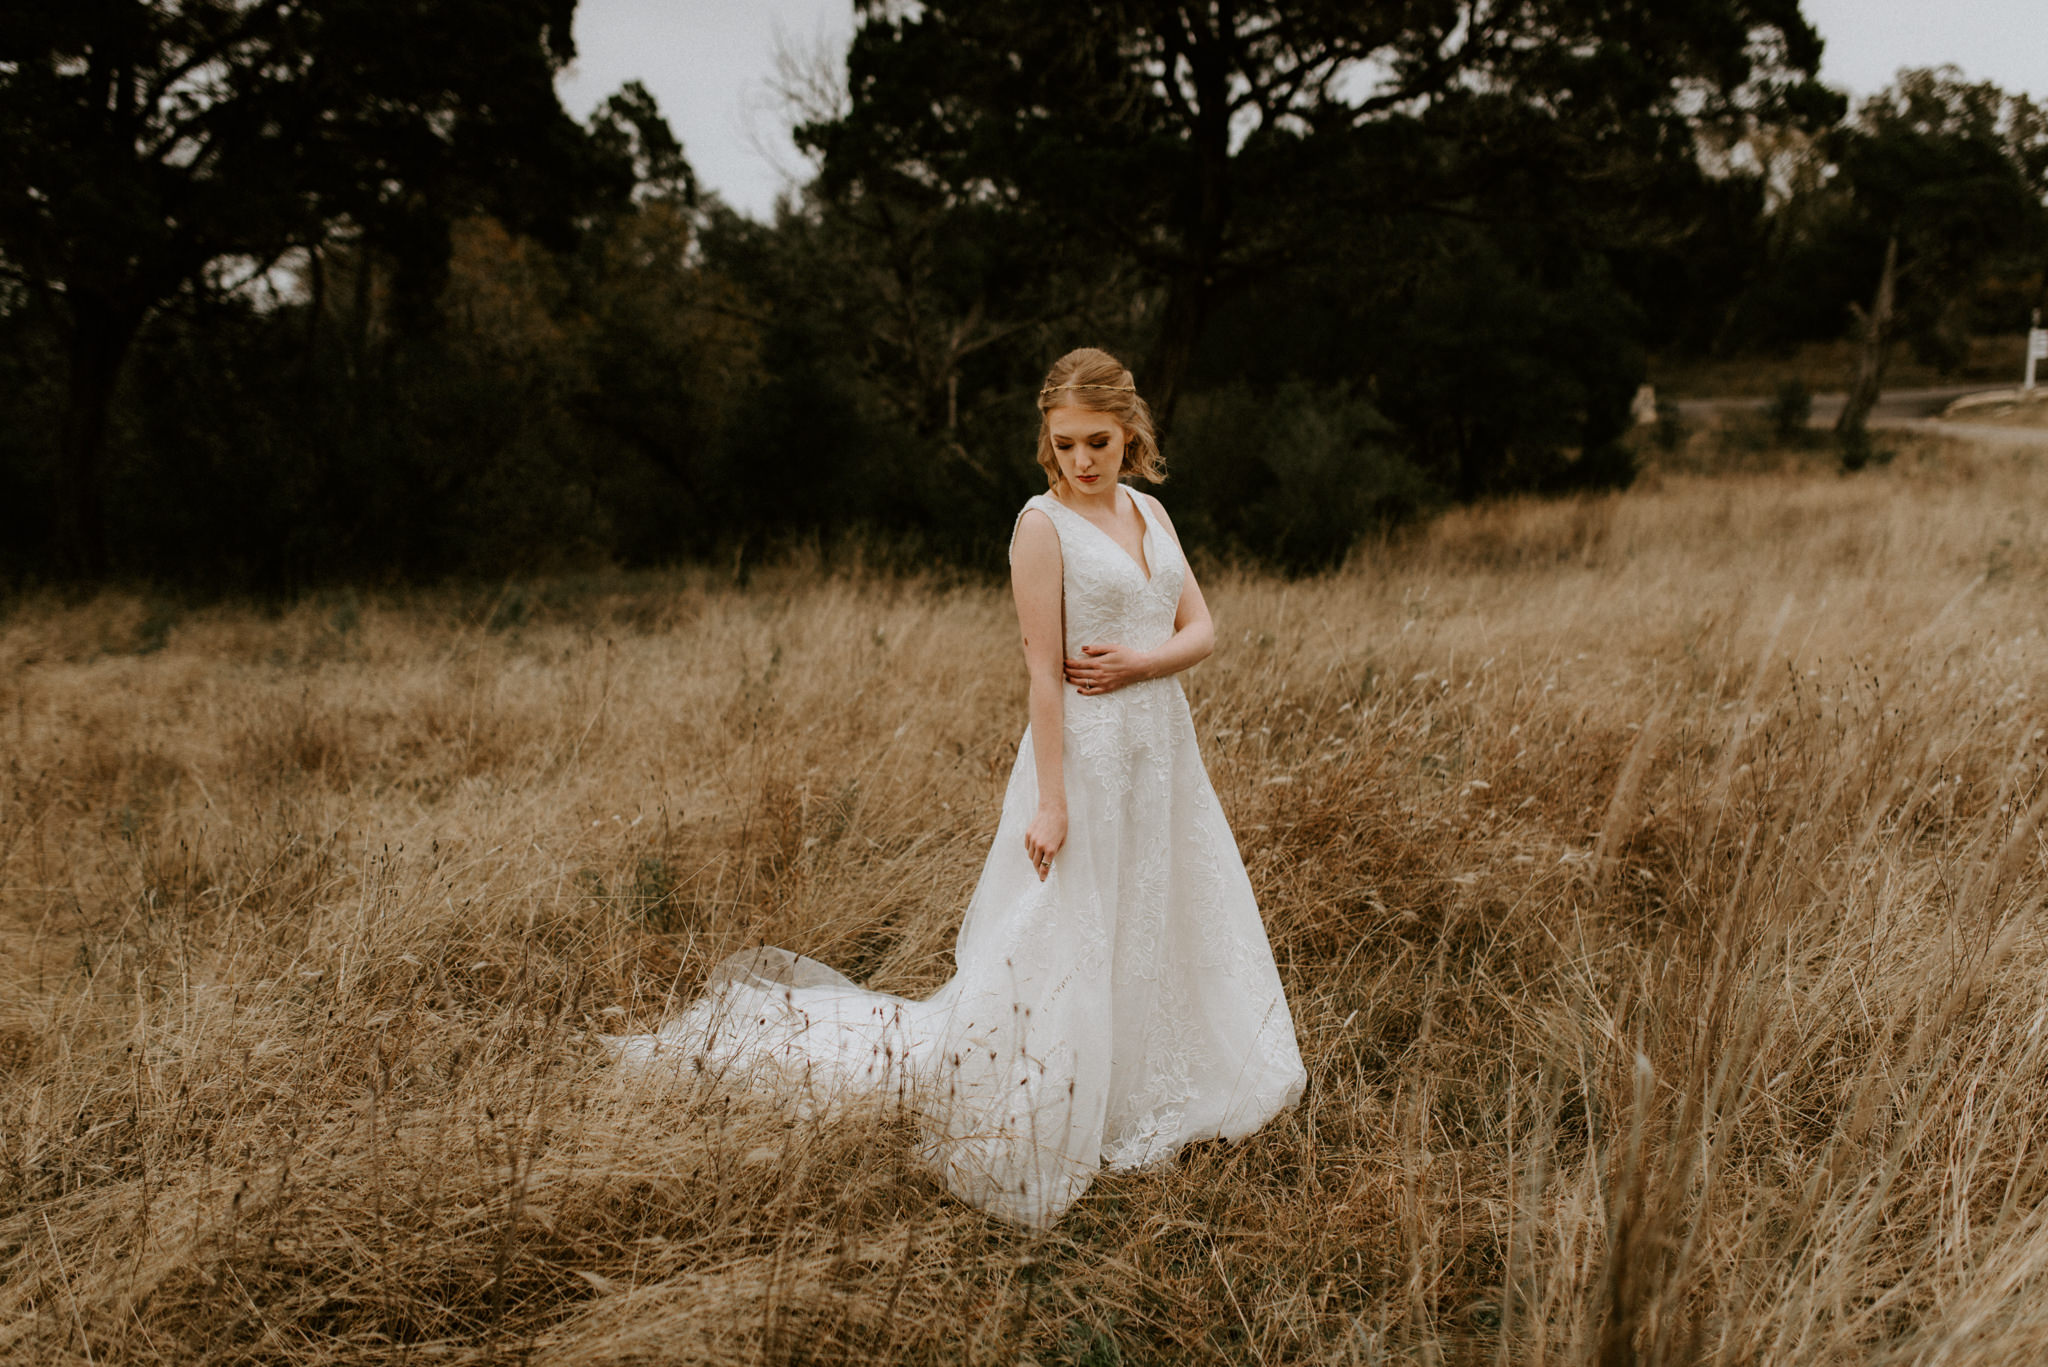 Kerlyn-Van-Gelder-Photography-Corpus-Christi-Photographer435.jpg